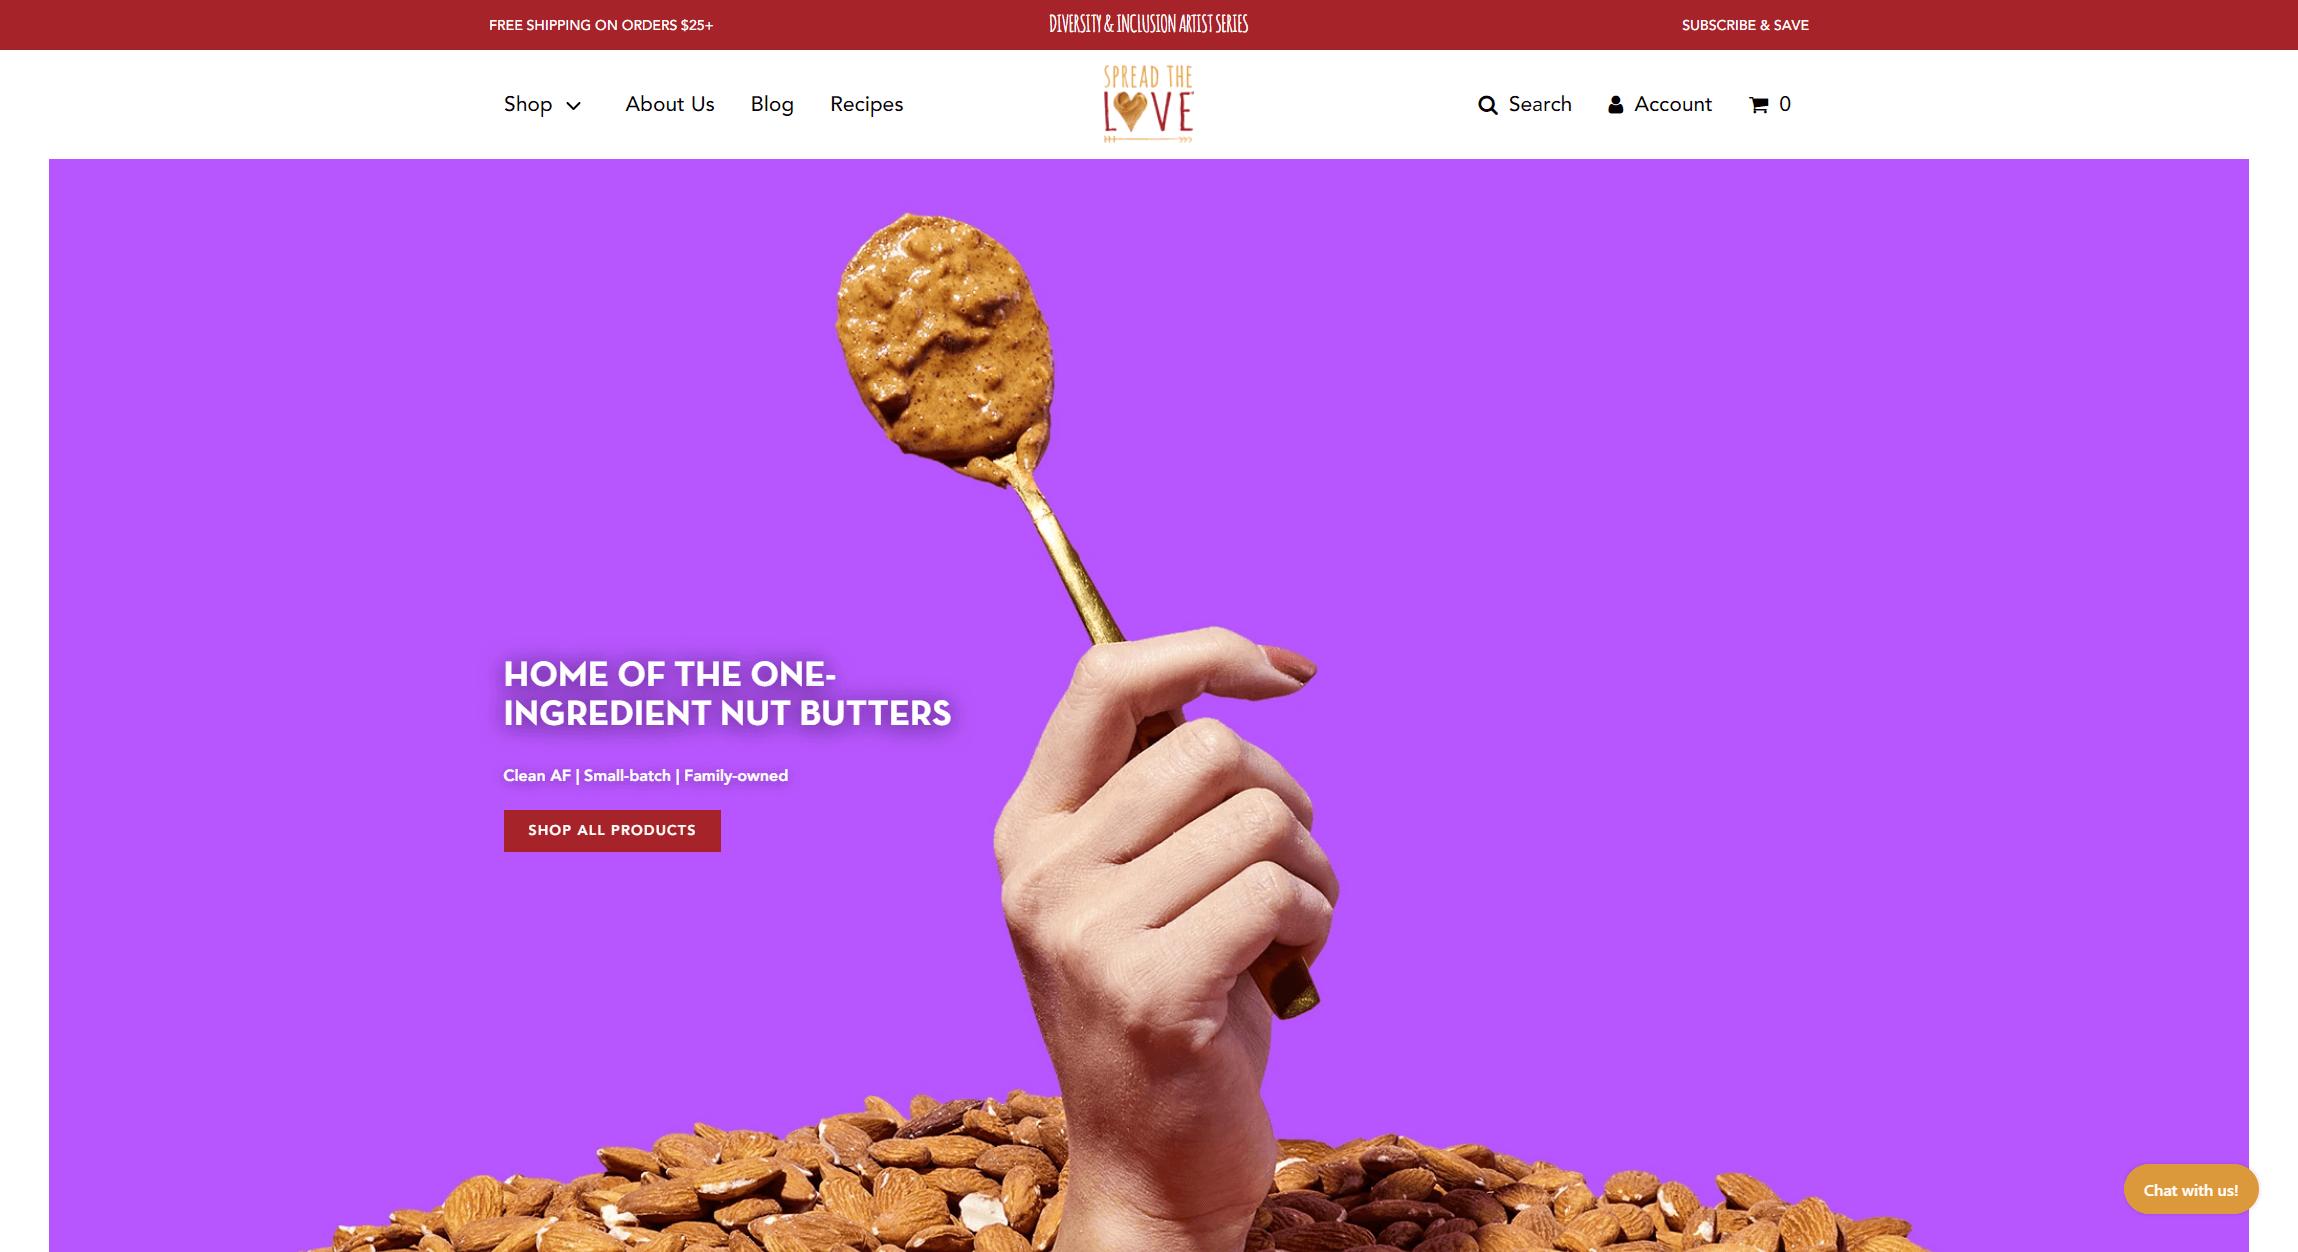 spreadthelovefoods.com